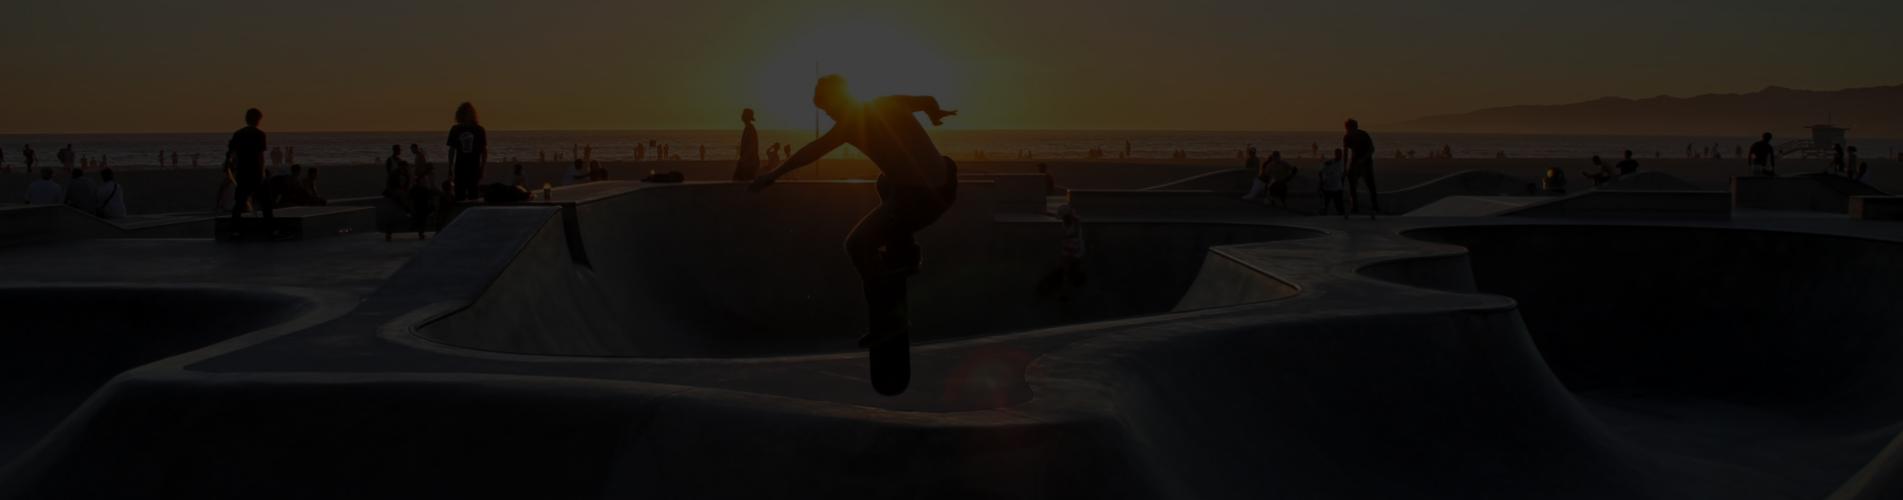 slider_doxoc_skate_1